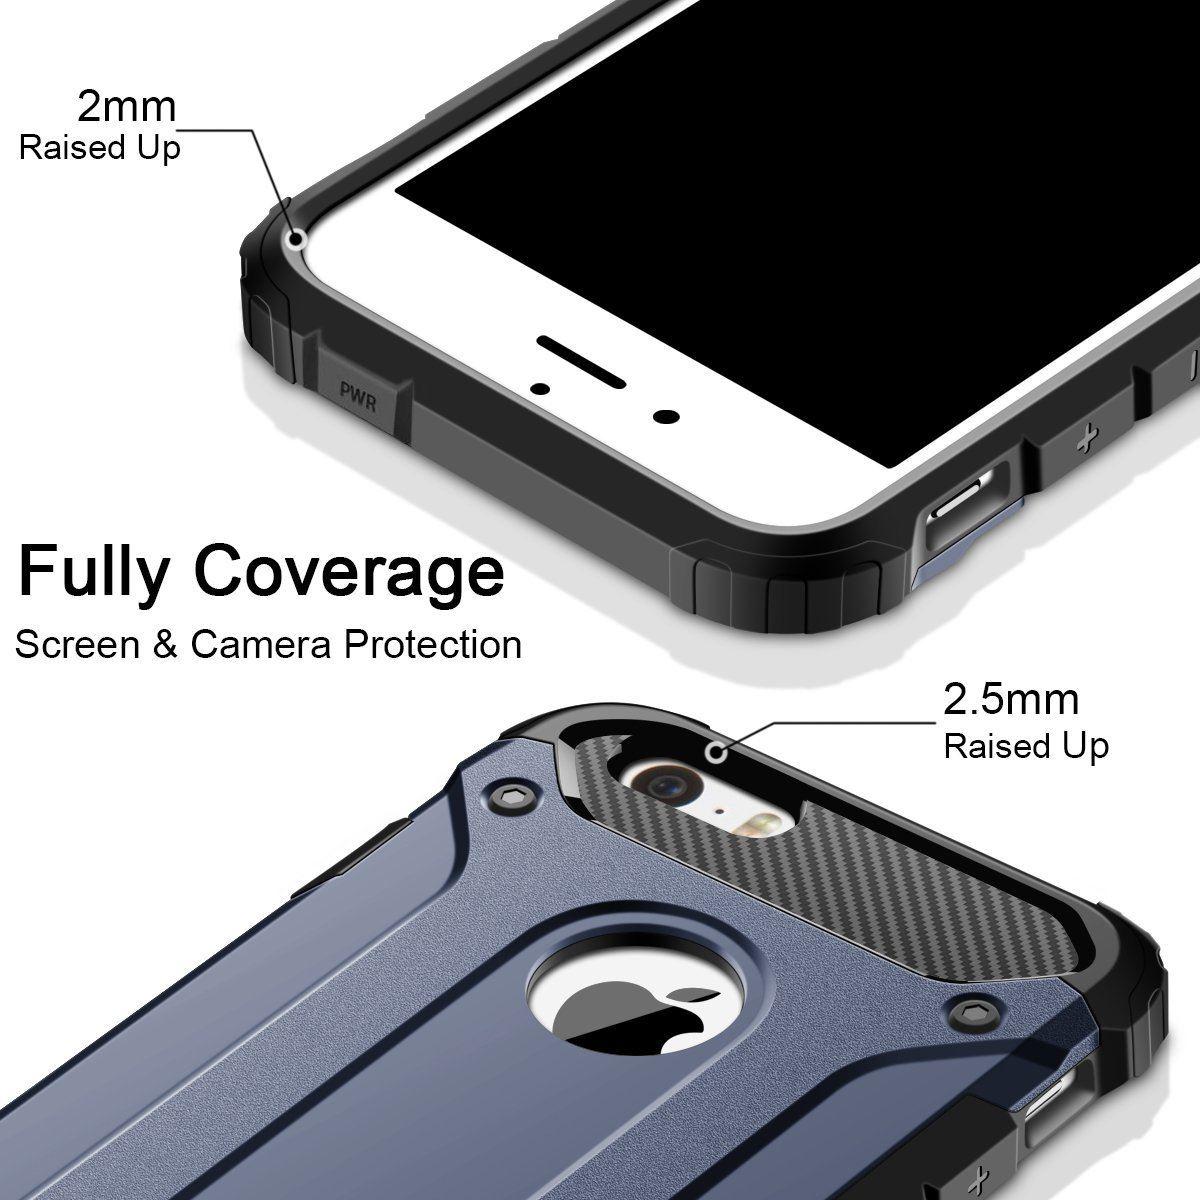 thumbnail 65 - For Apple iPhone 11 Pro Max XR Xs X 8 7 Plus 6 5 Se Case Cover Tough Armor